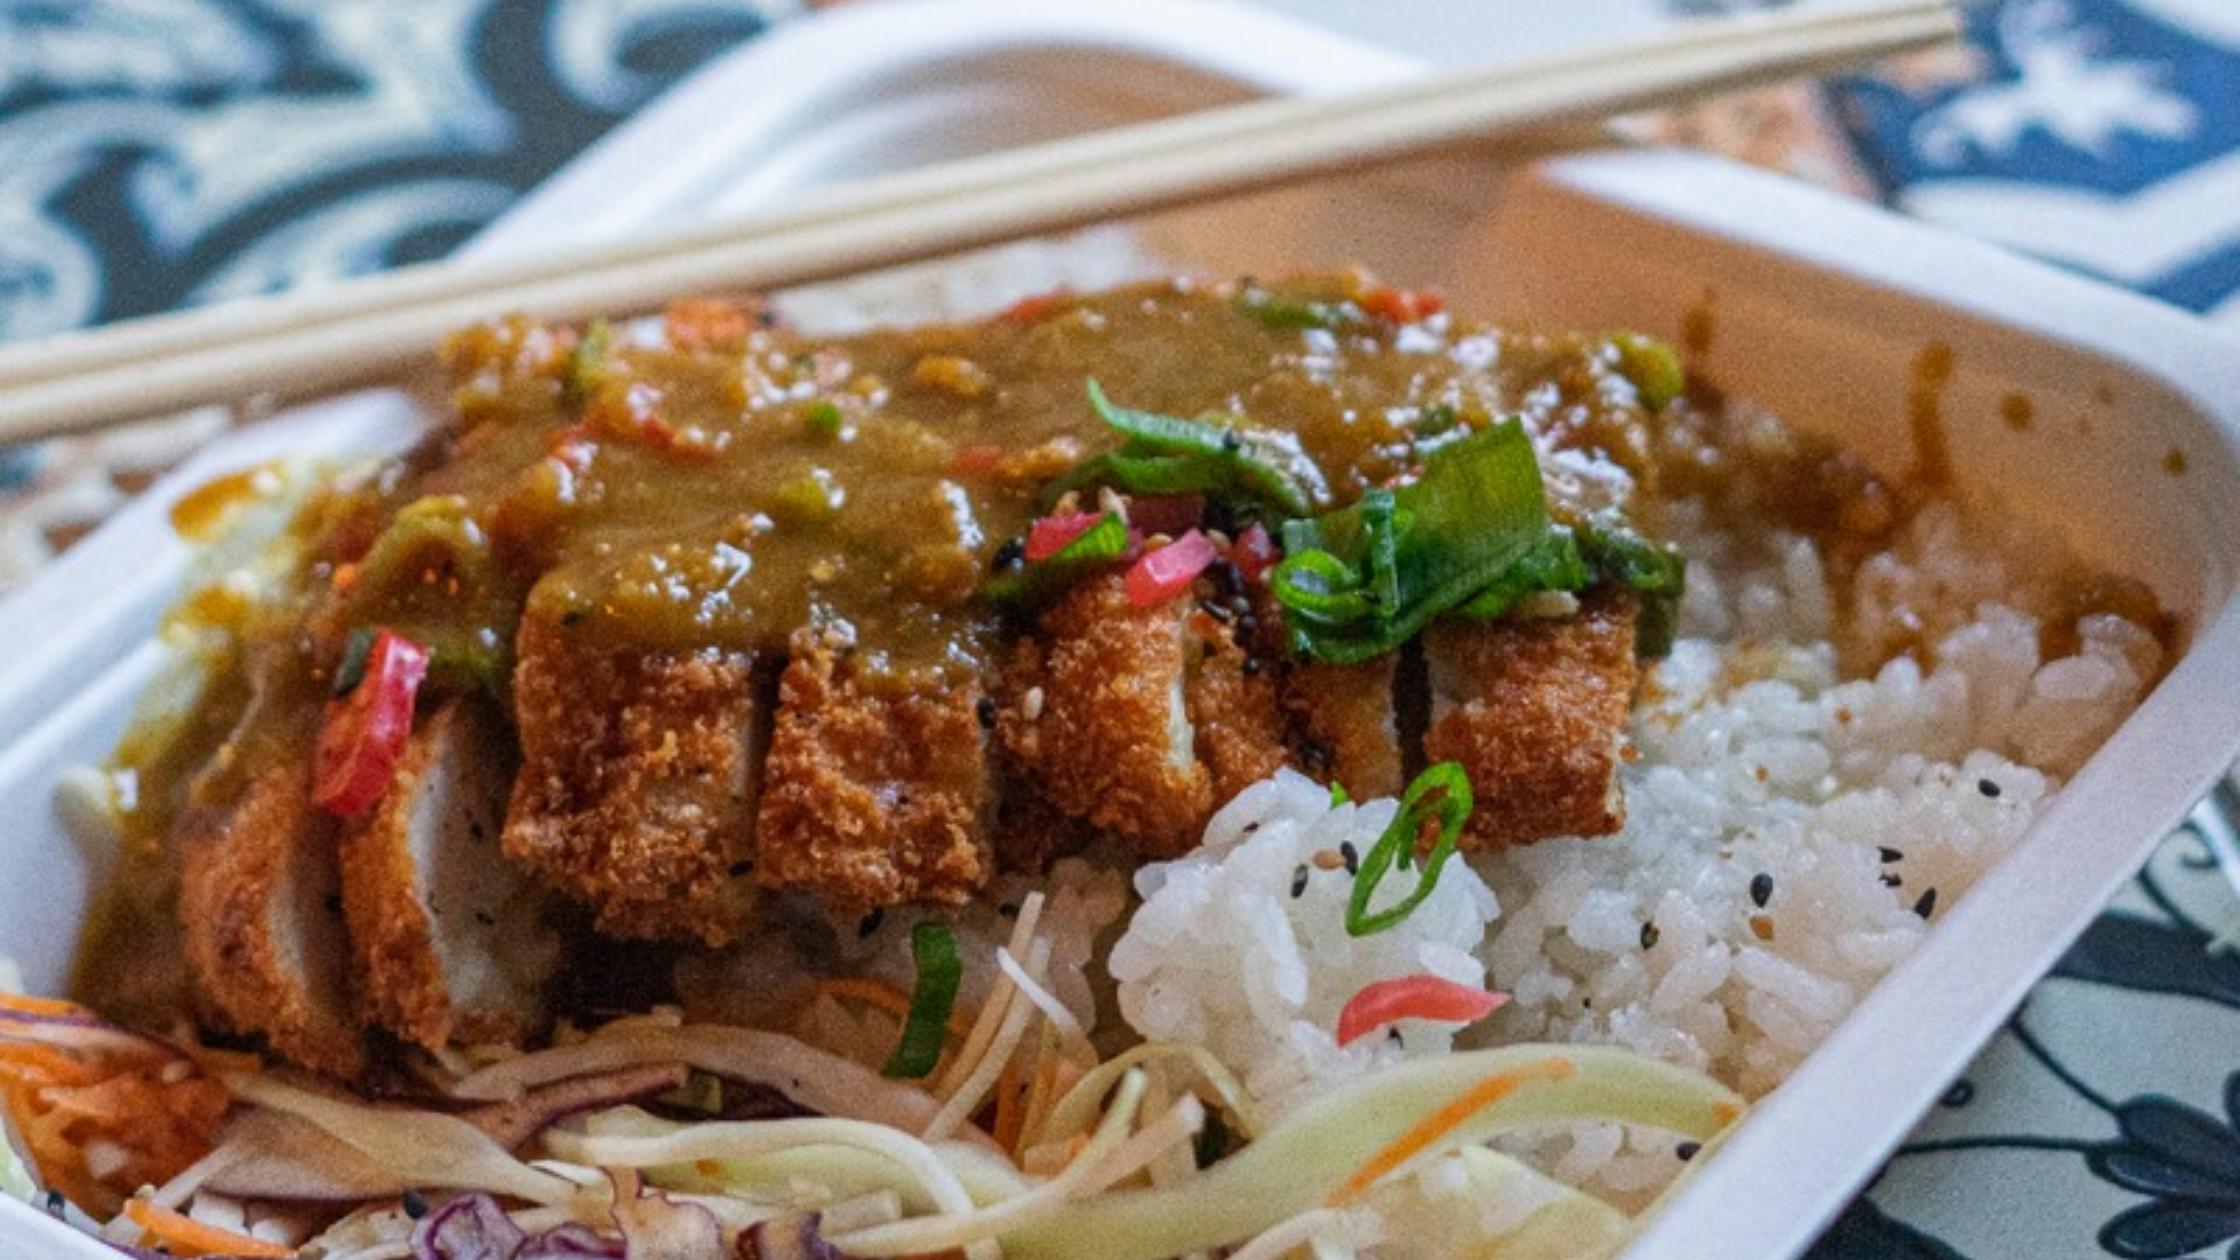 Heathy katsu curry meal from Rainbo